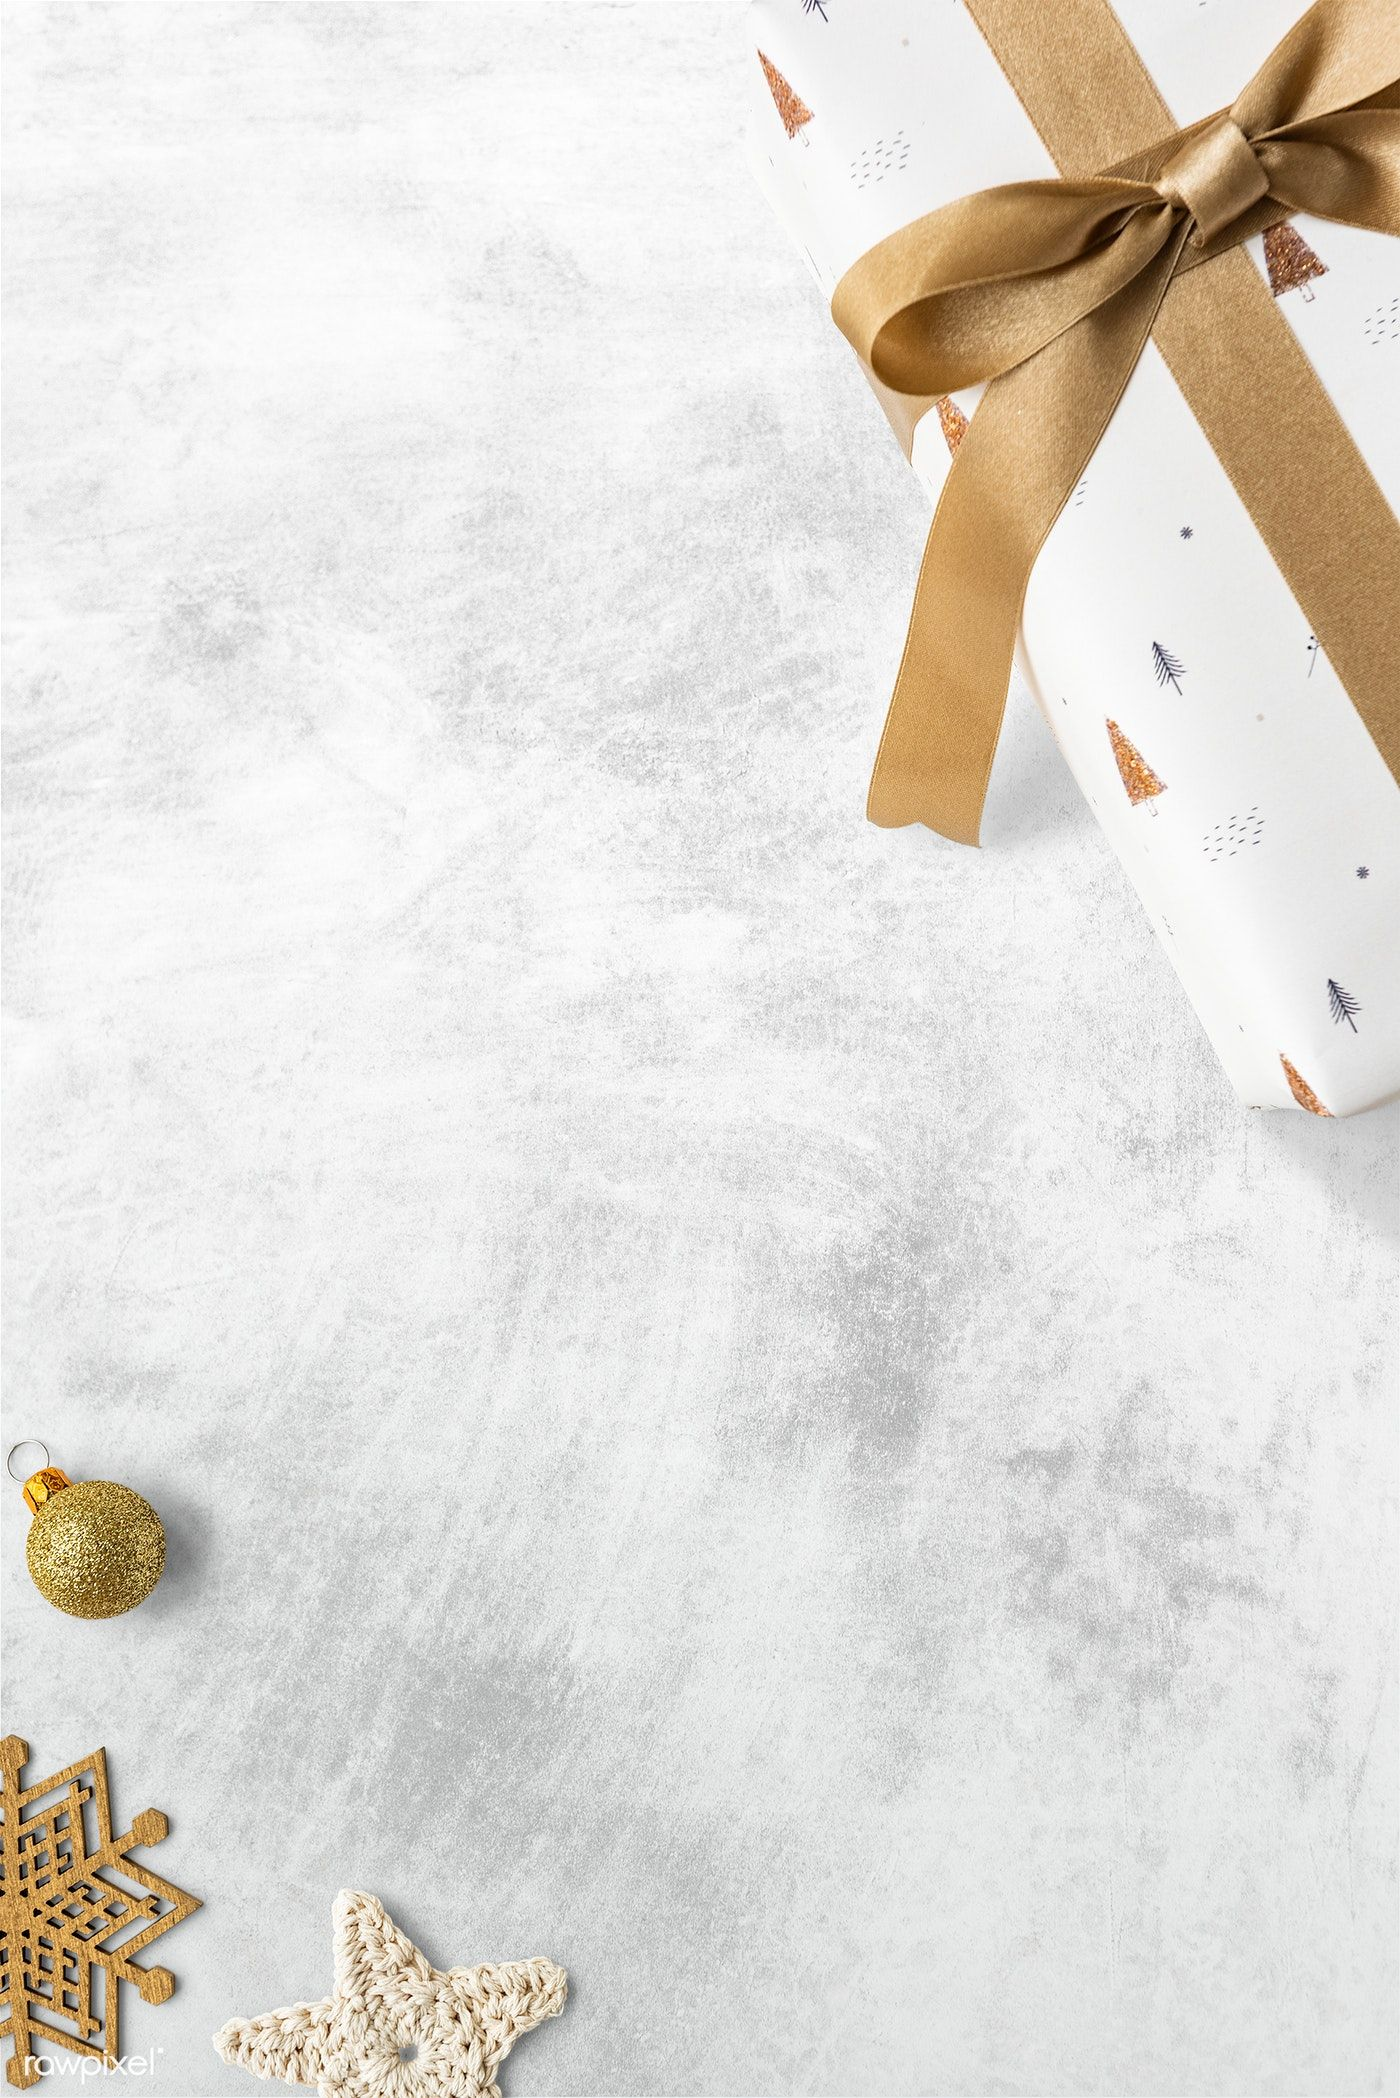 Download Premium Image Of Blank Festive Christmas Ornament Frame